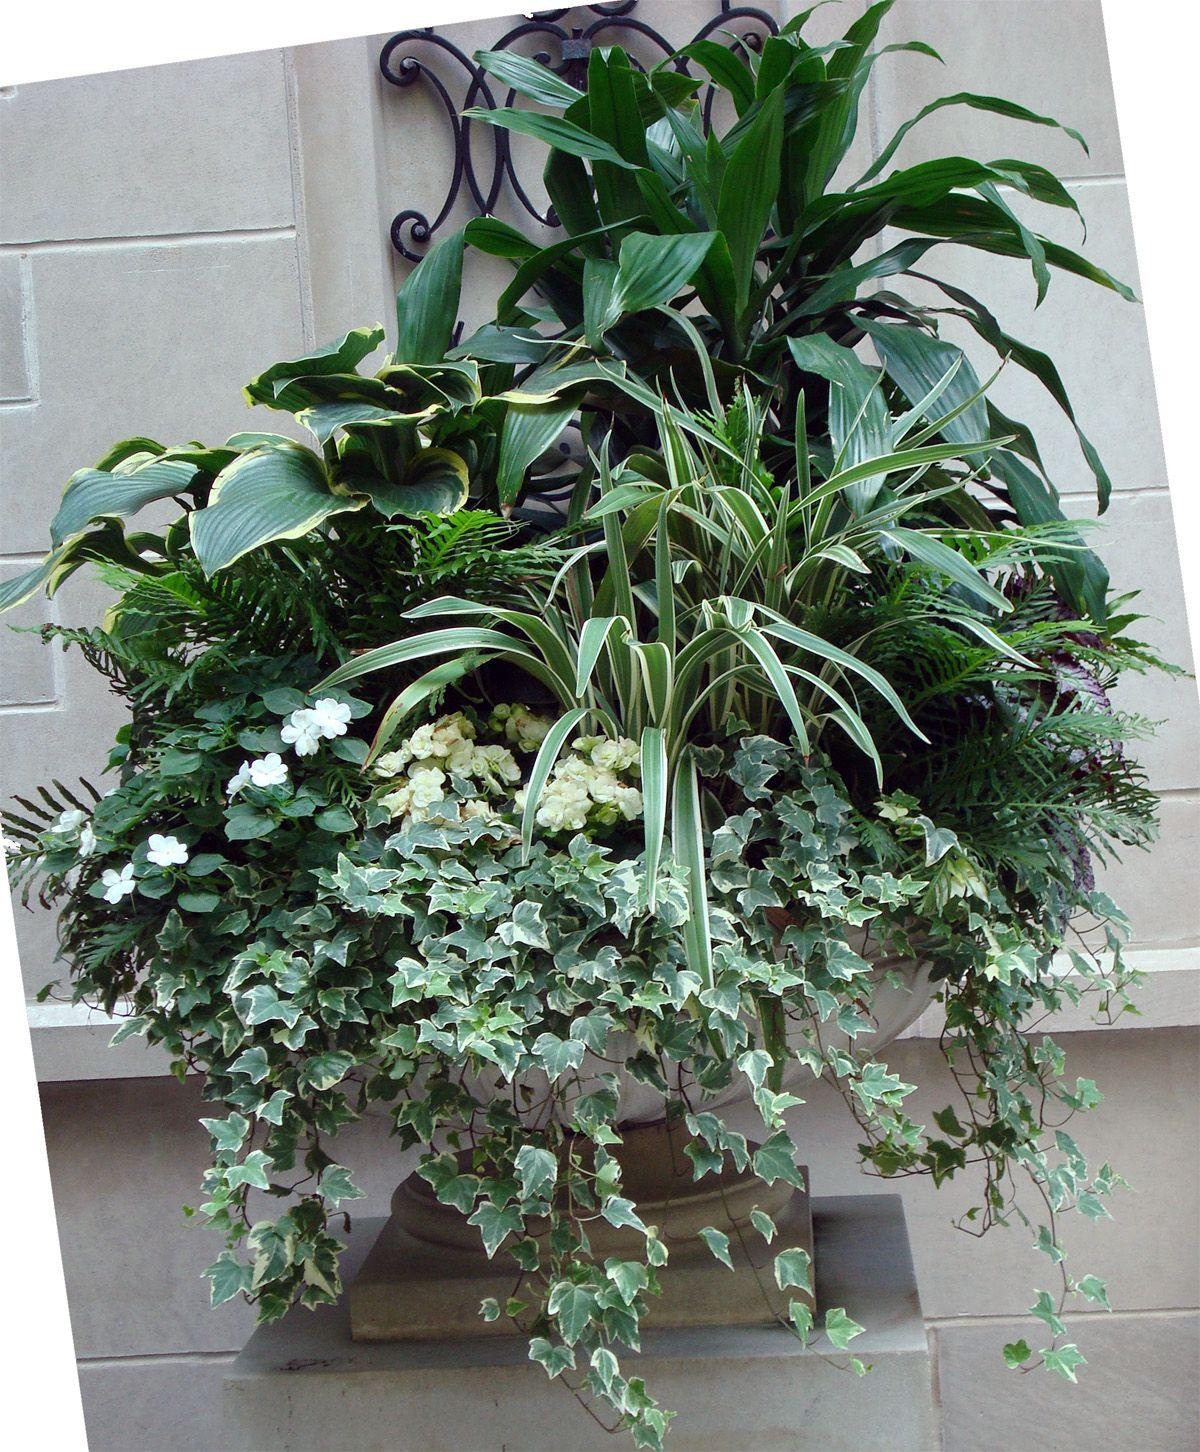 summer  planter  container  greens  whites  urban  garden  landscape  design  entryway